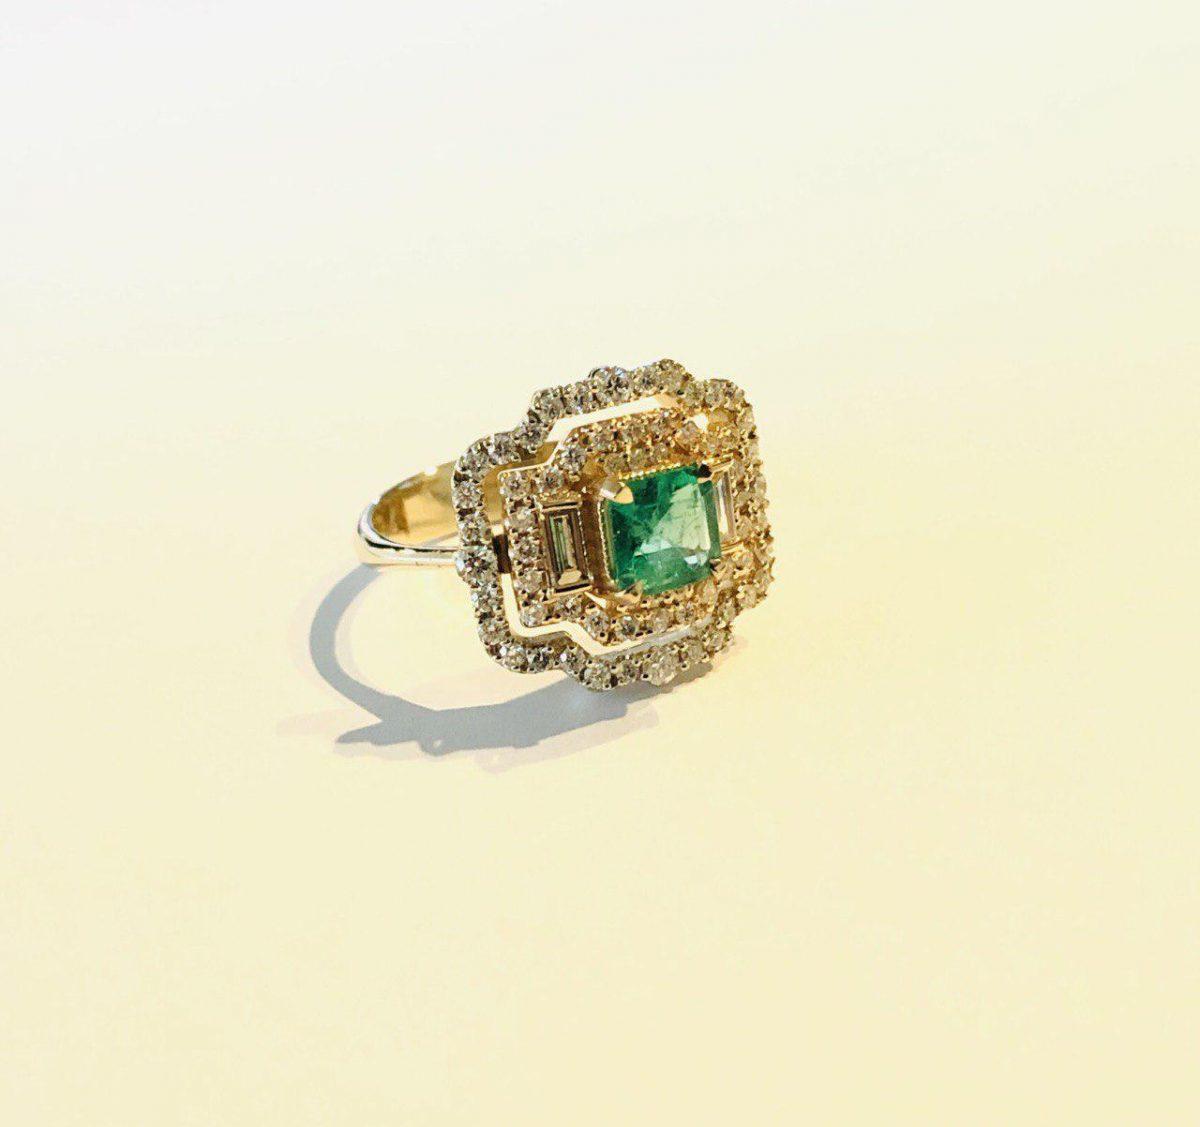 انگشتر جواهر و زمرد